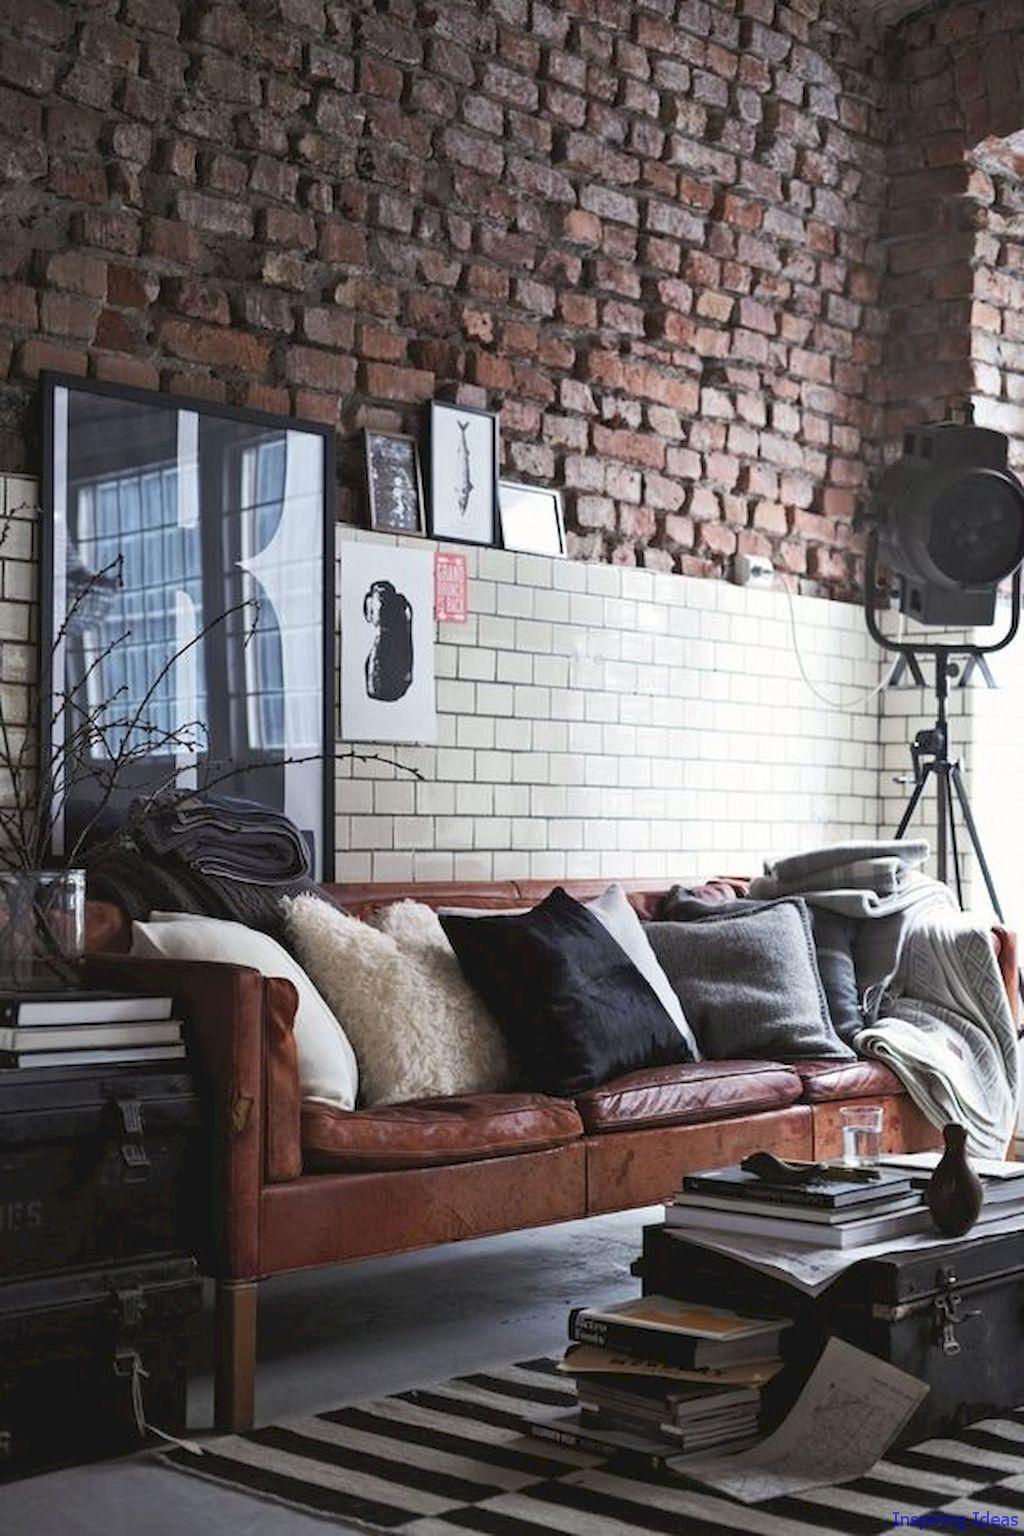 47 Great Apartment Decorating Ideas for Men - Lovelyving.com & 47 Great Apartment Decorating Ideas for Men | Apartments decorating ...